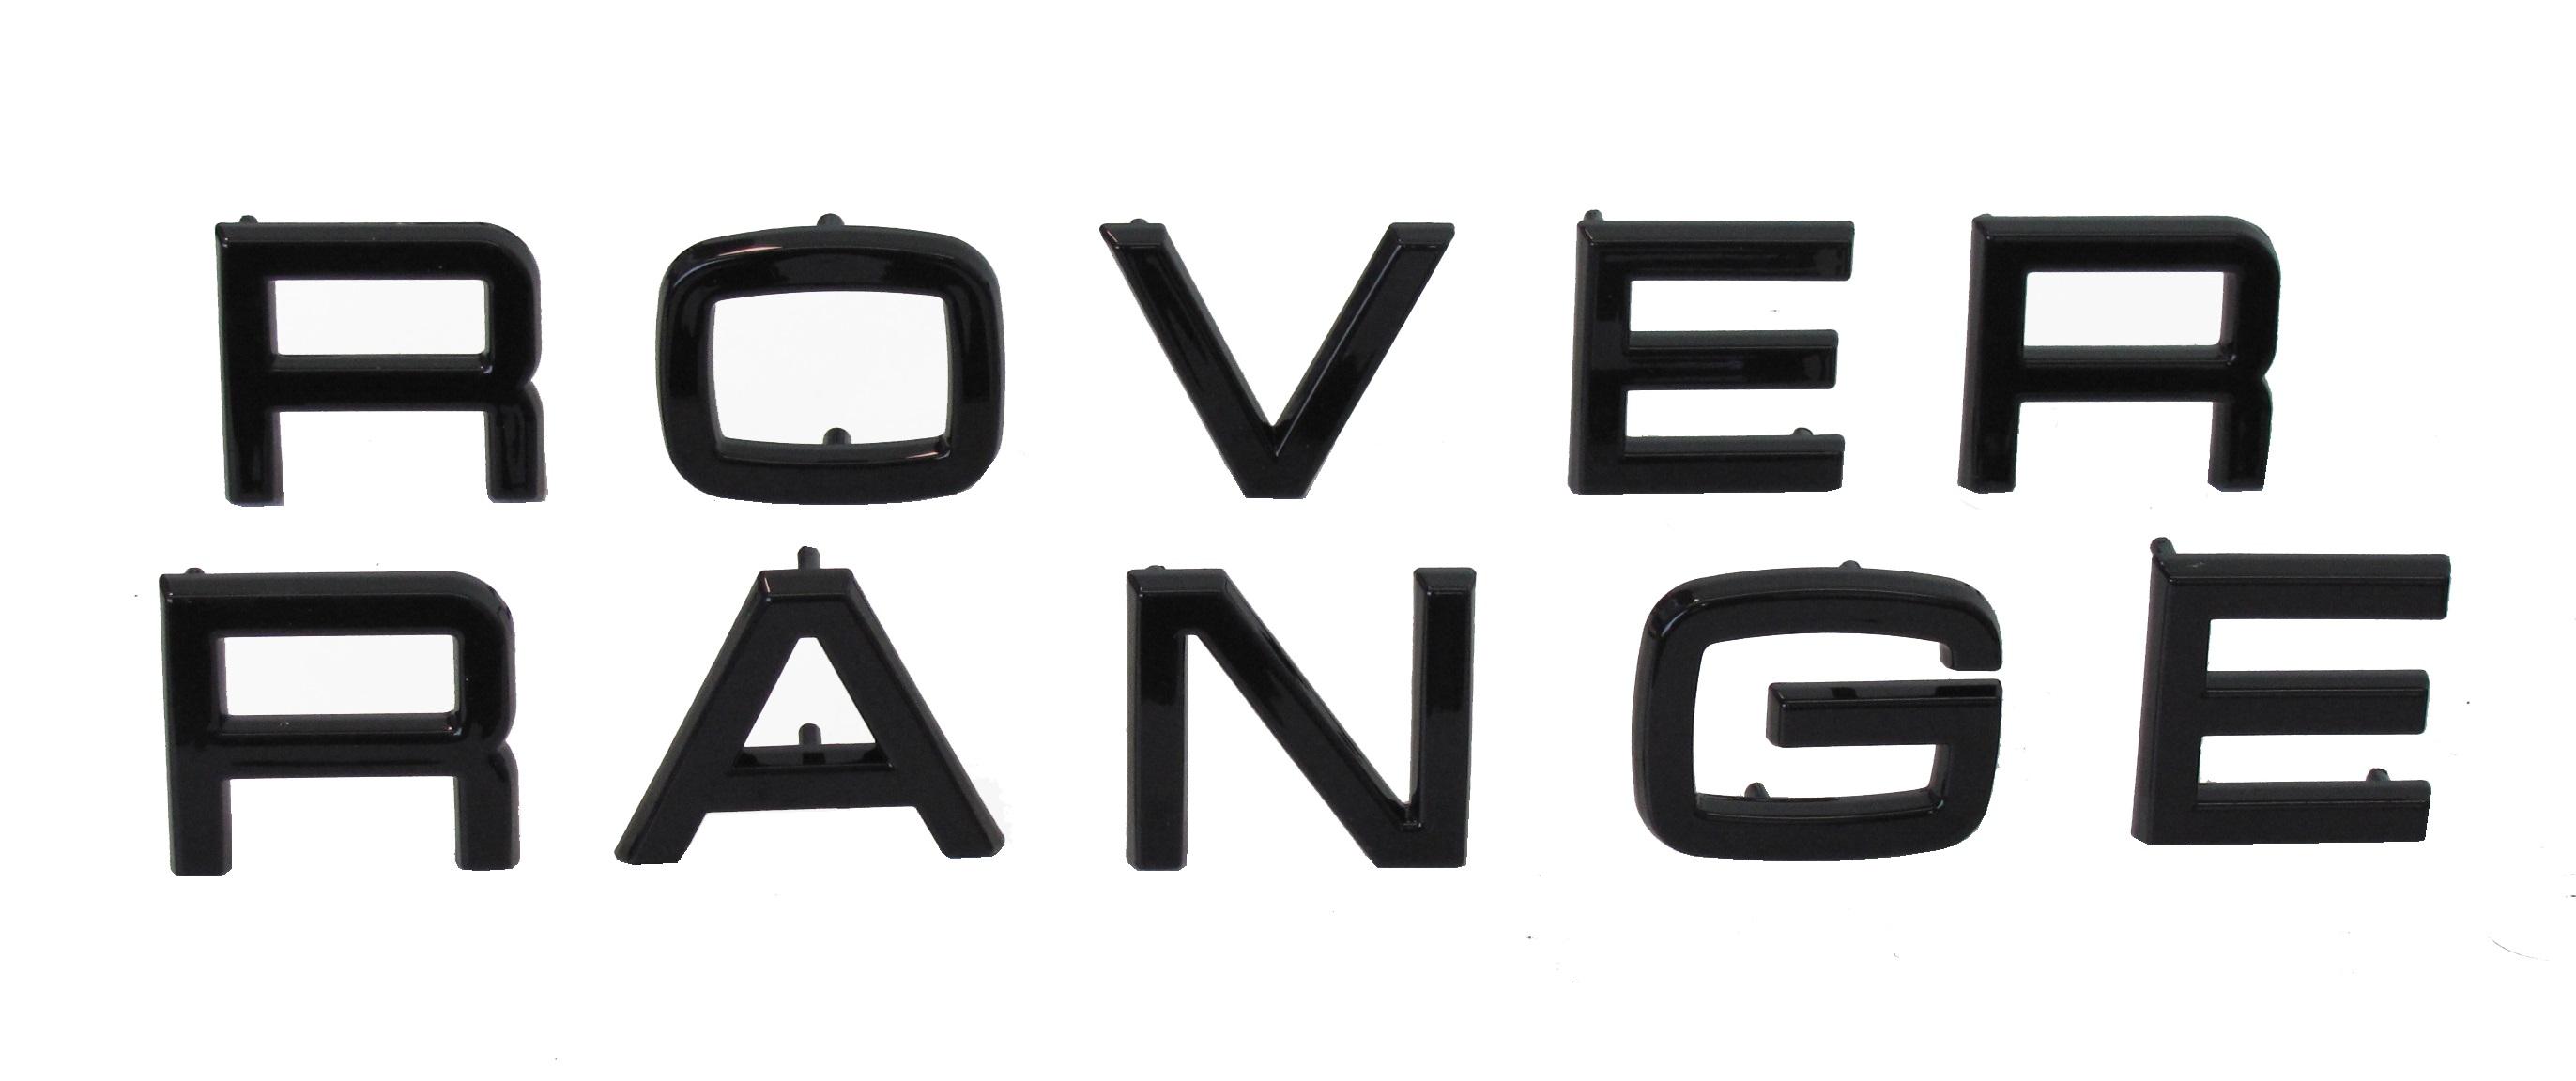 Black Lettering original pin type Range Rover Classic bonnet font